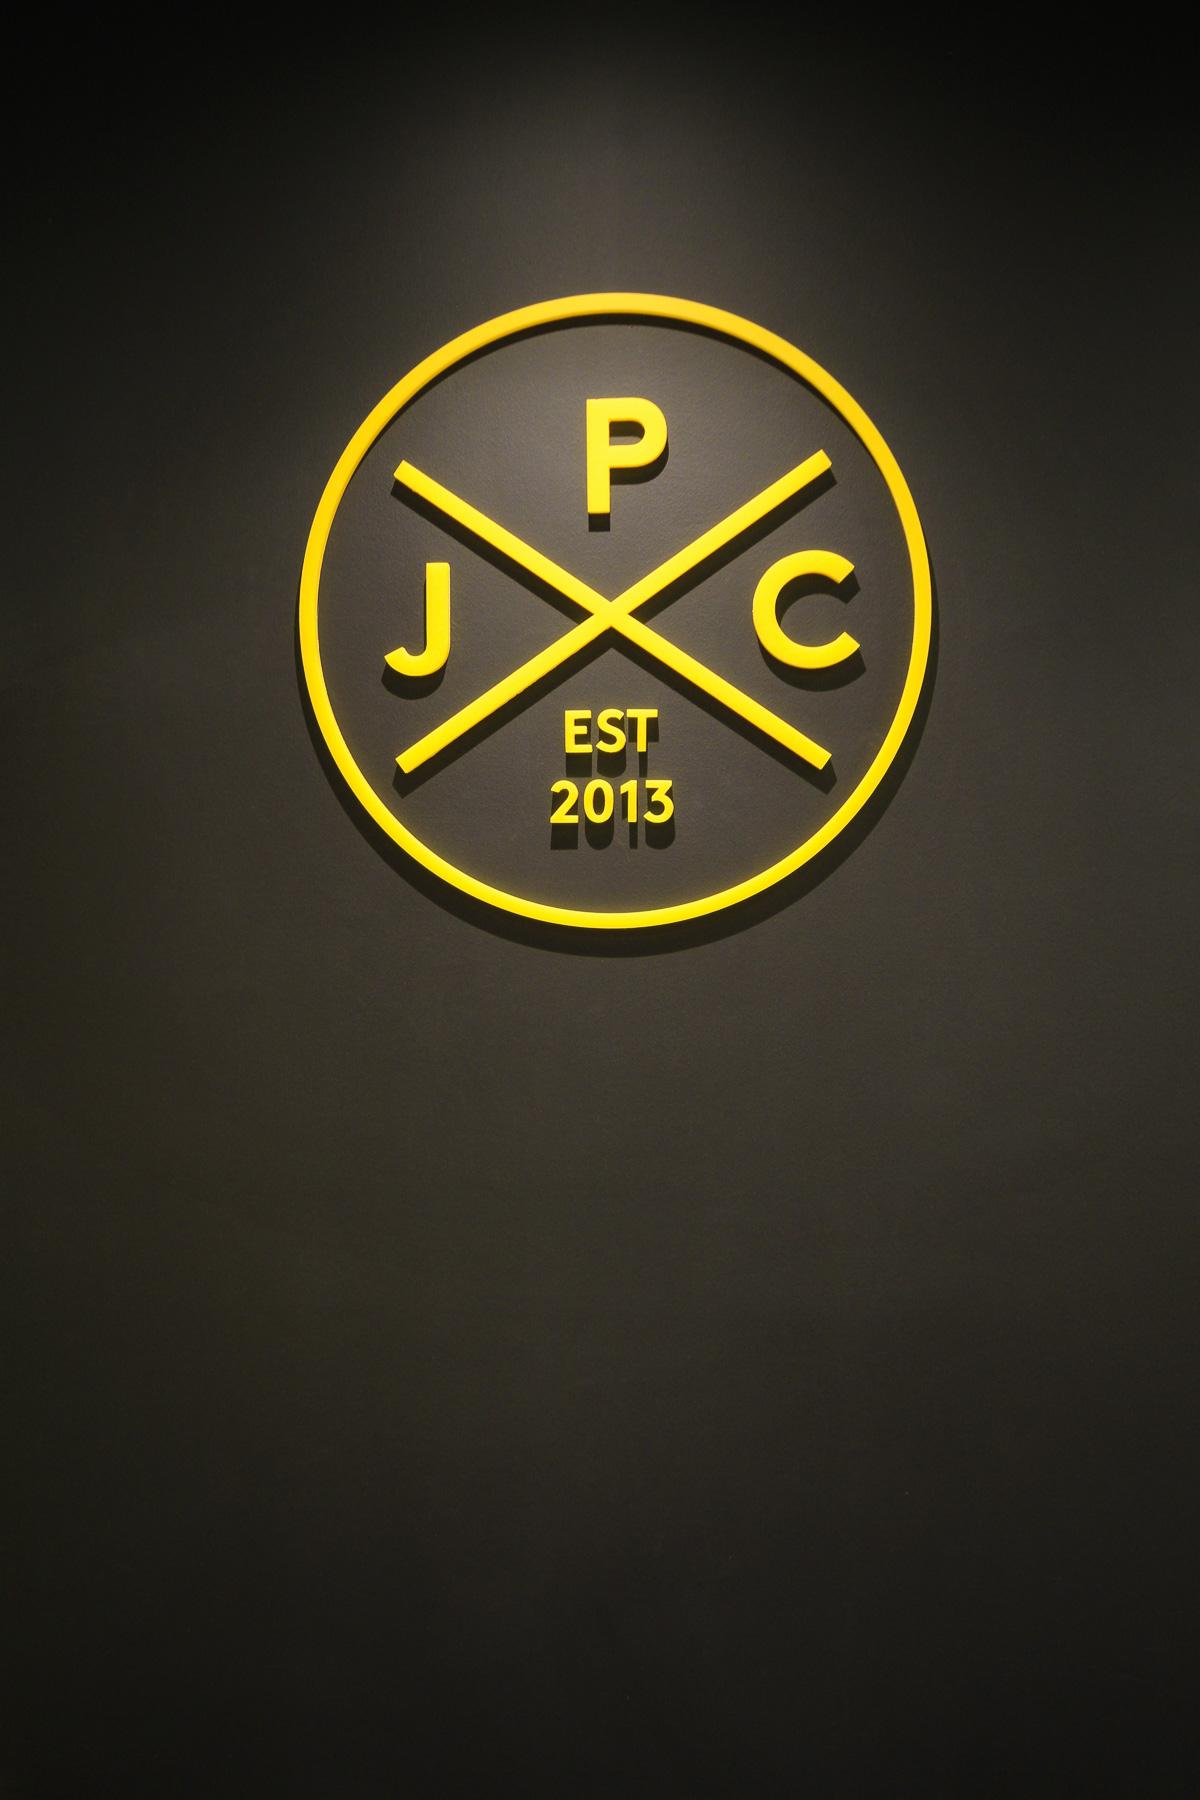 JPC_Highres_01.jpg